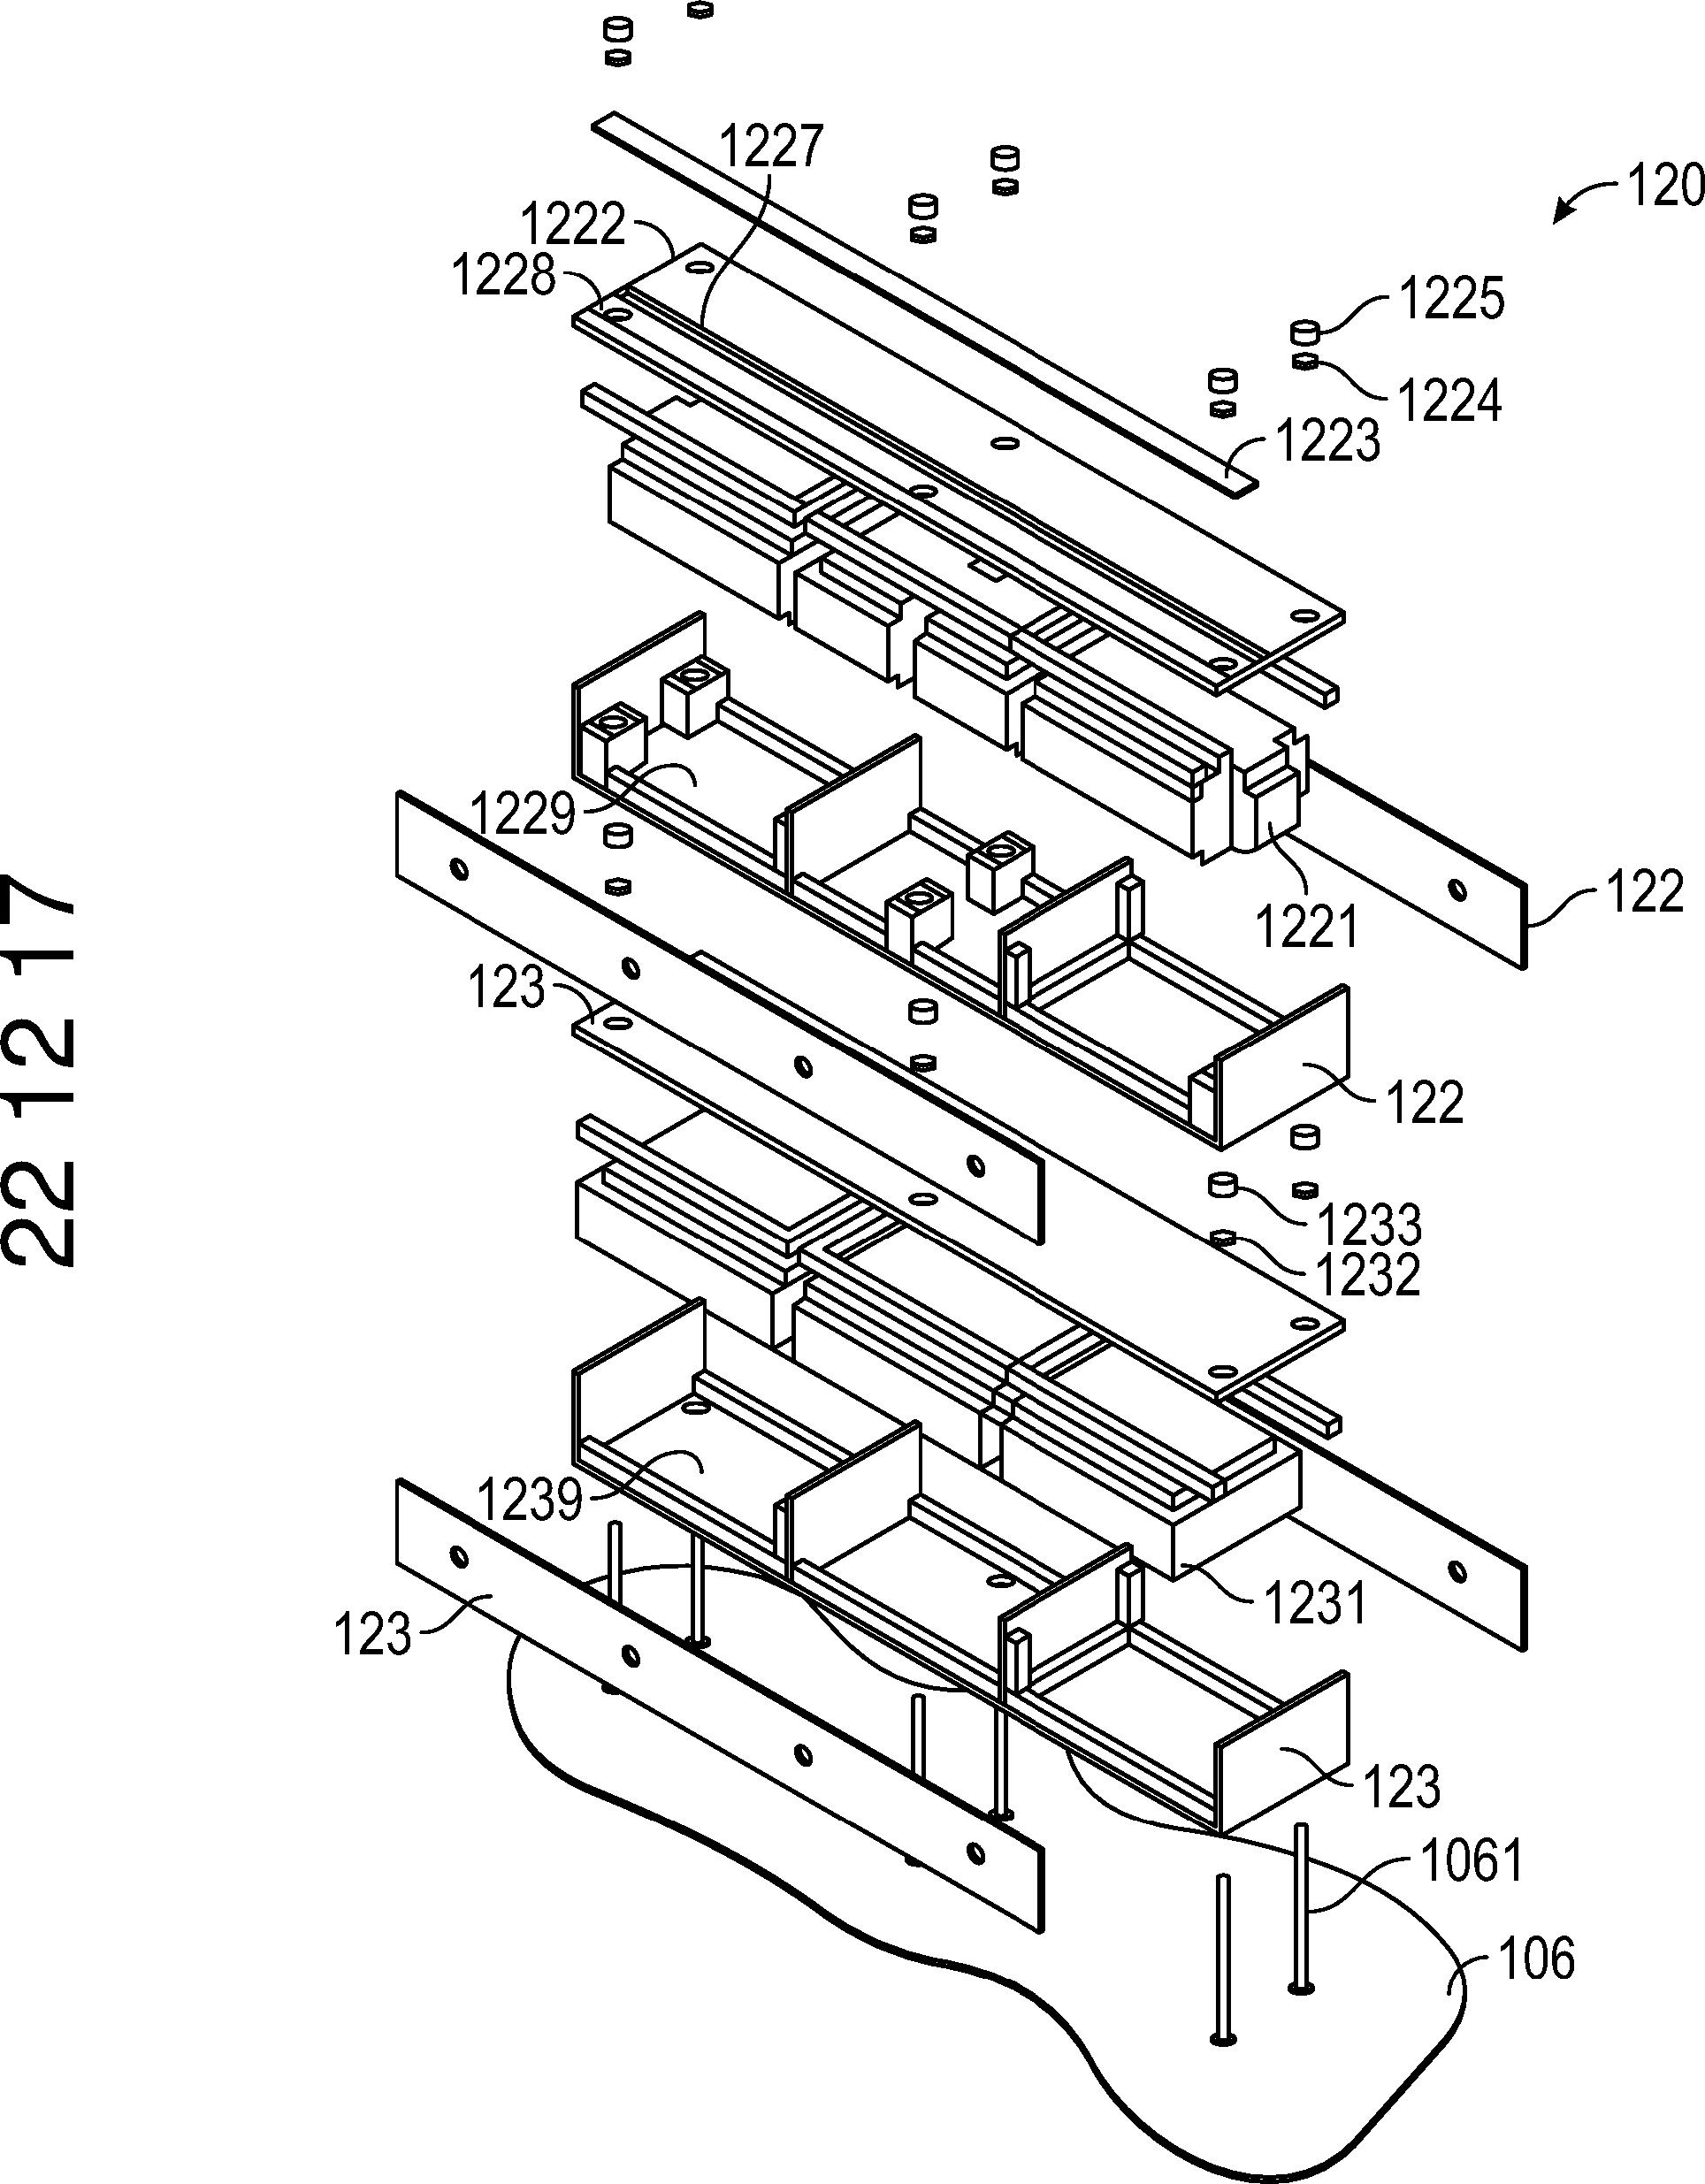 Figure GB2554862A_D0017